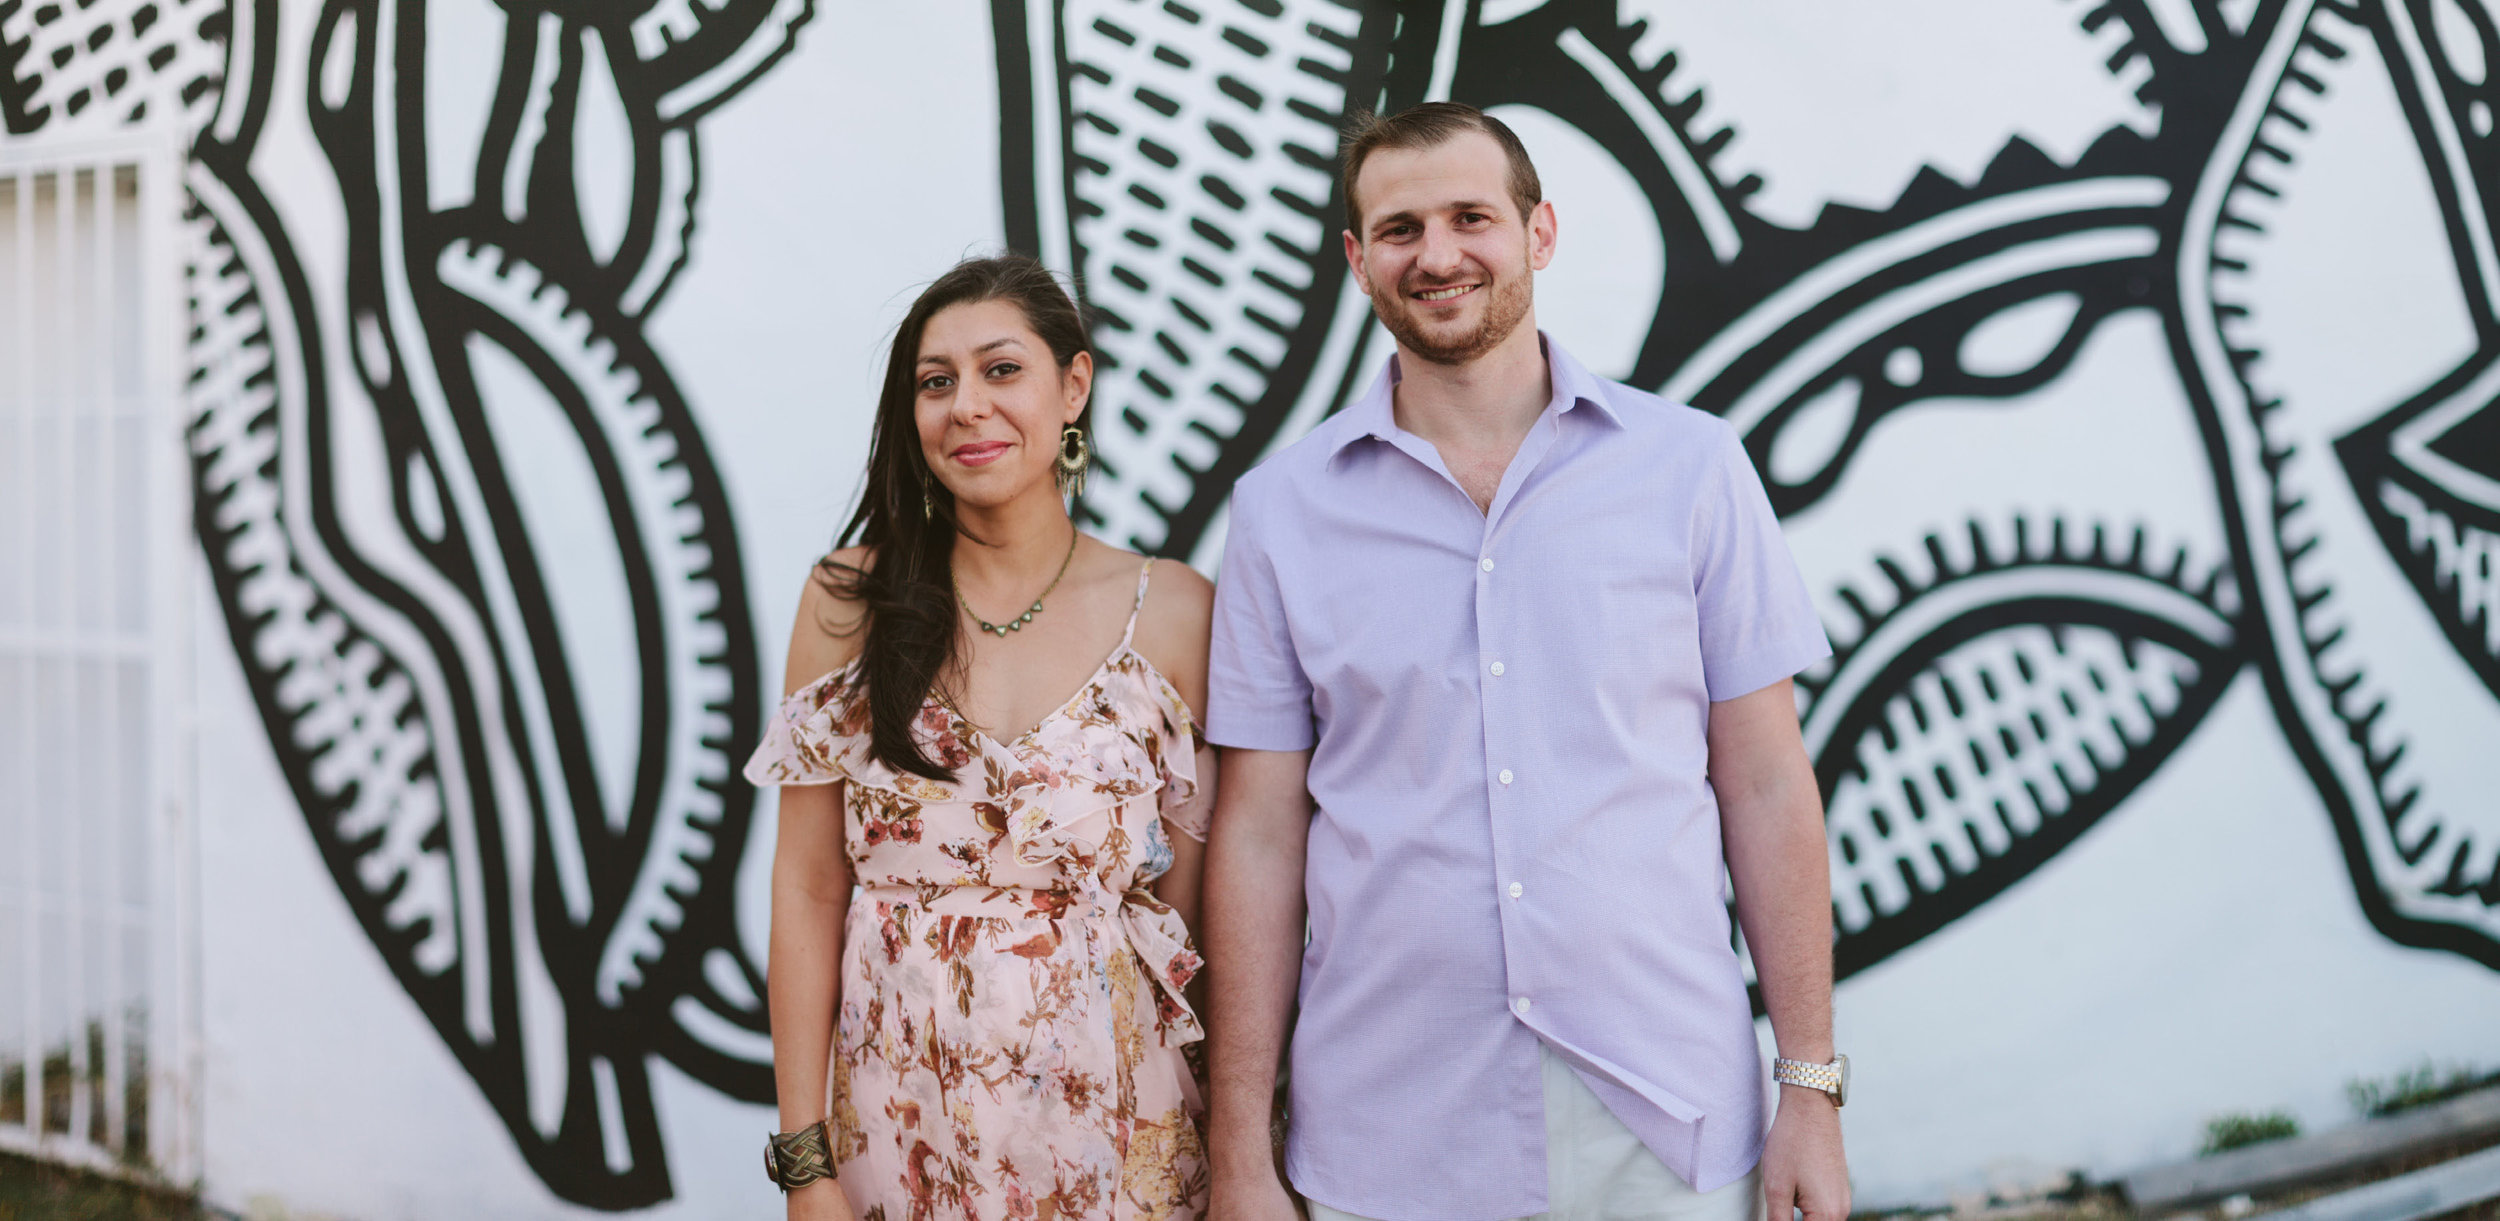 Miami Engagement Photos at Wynwood Walls6.jpg